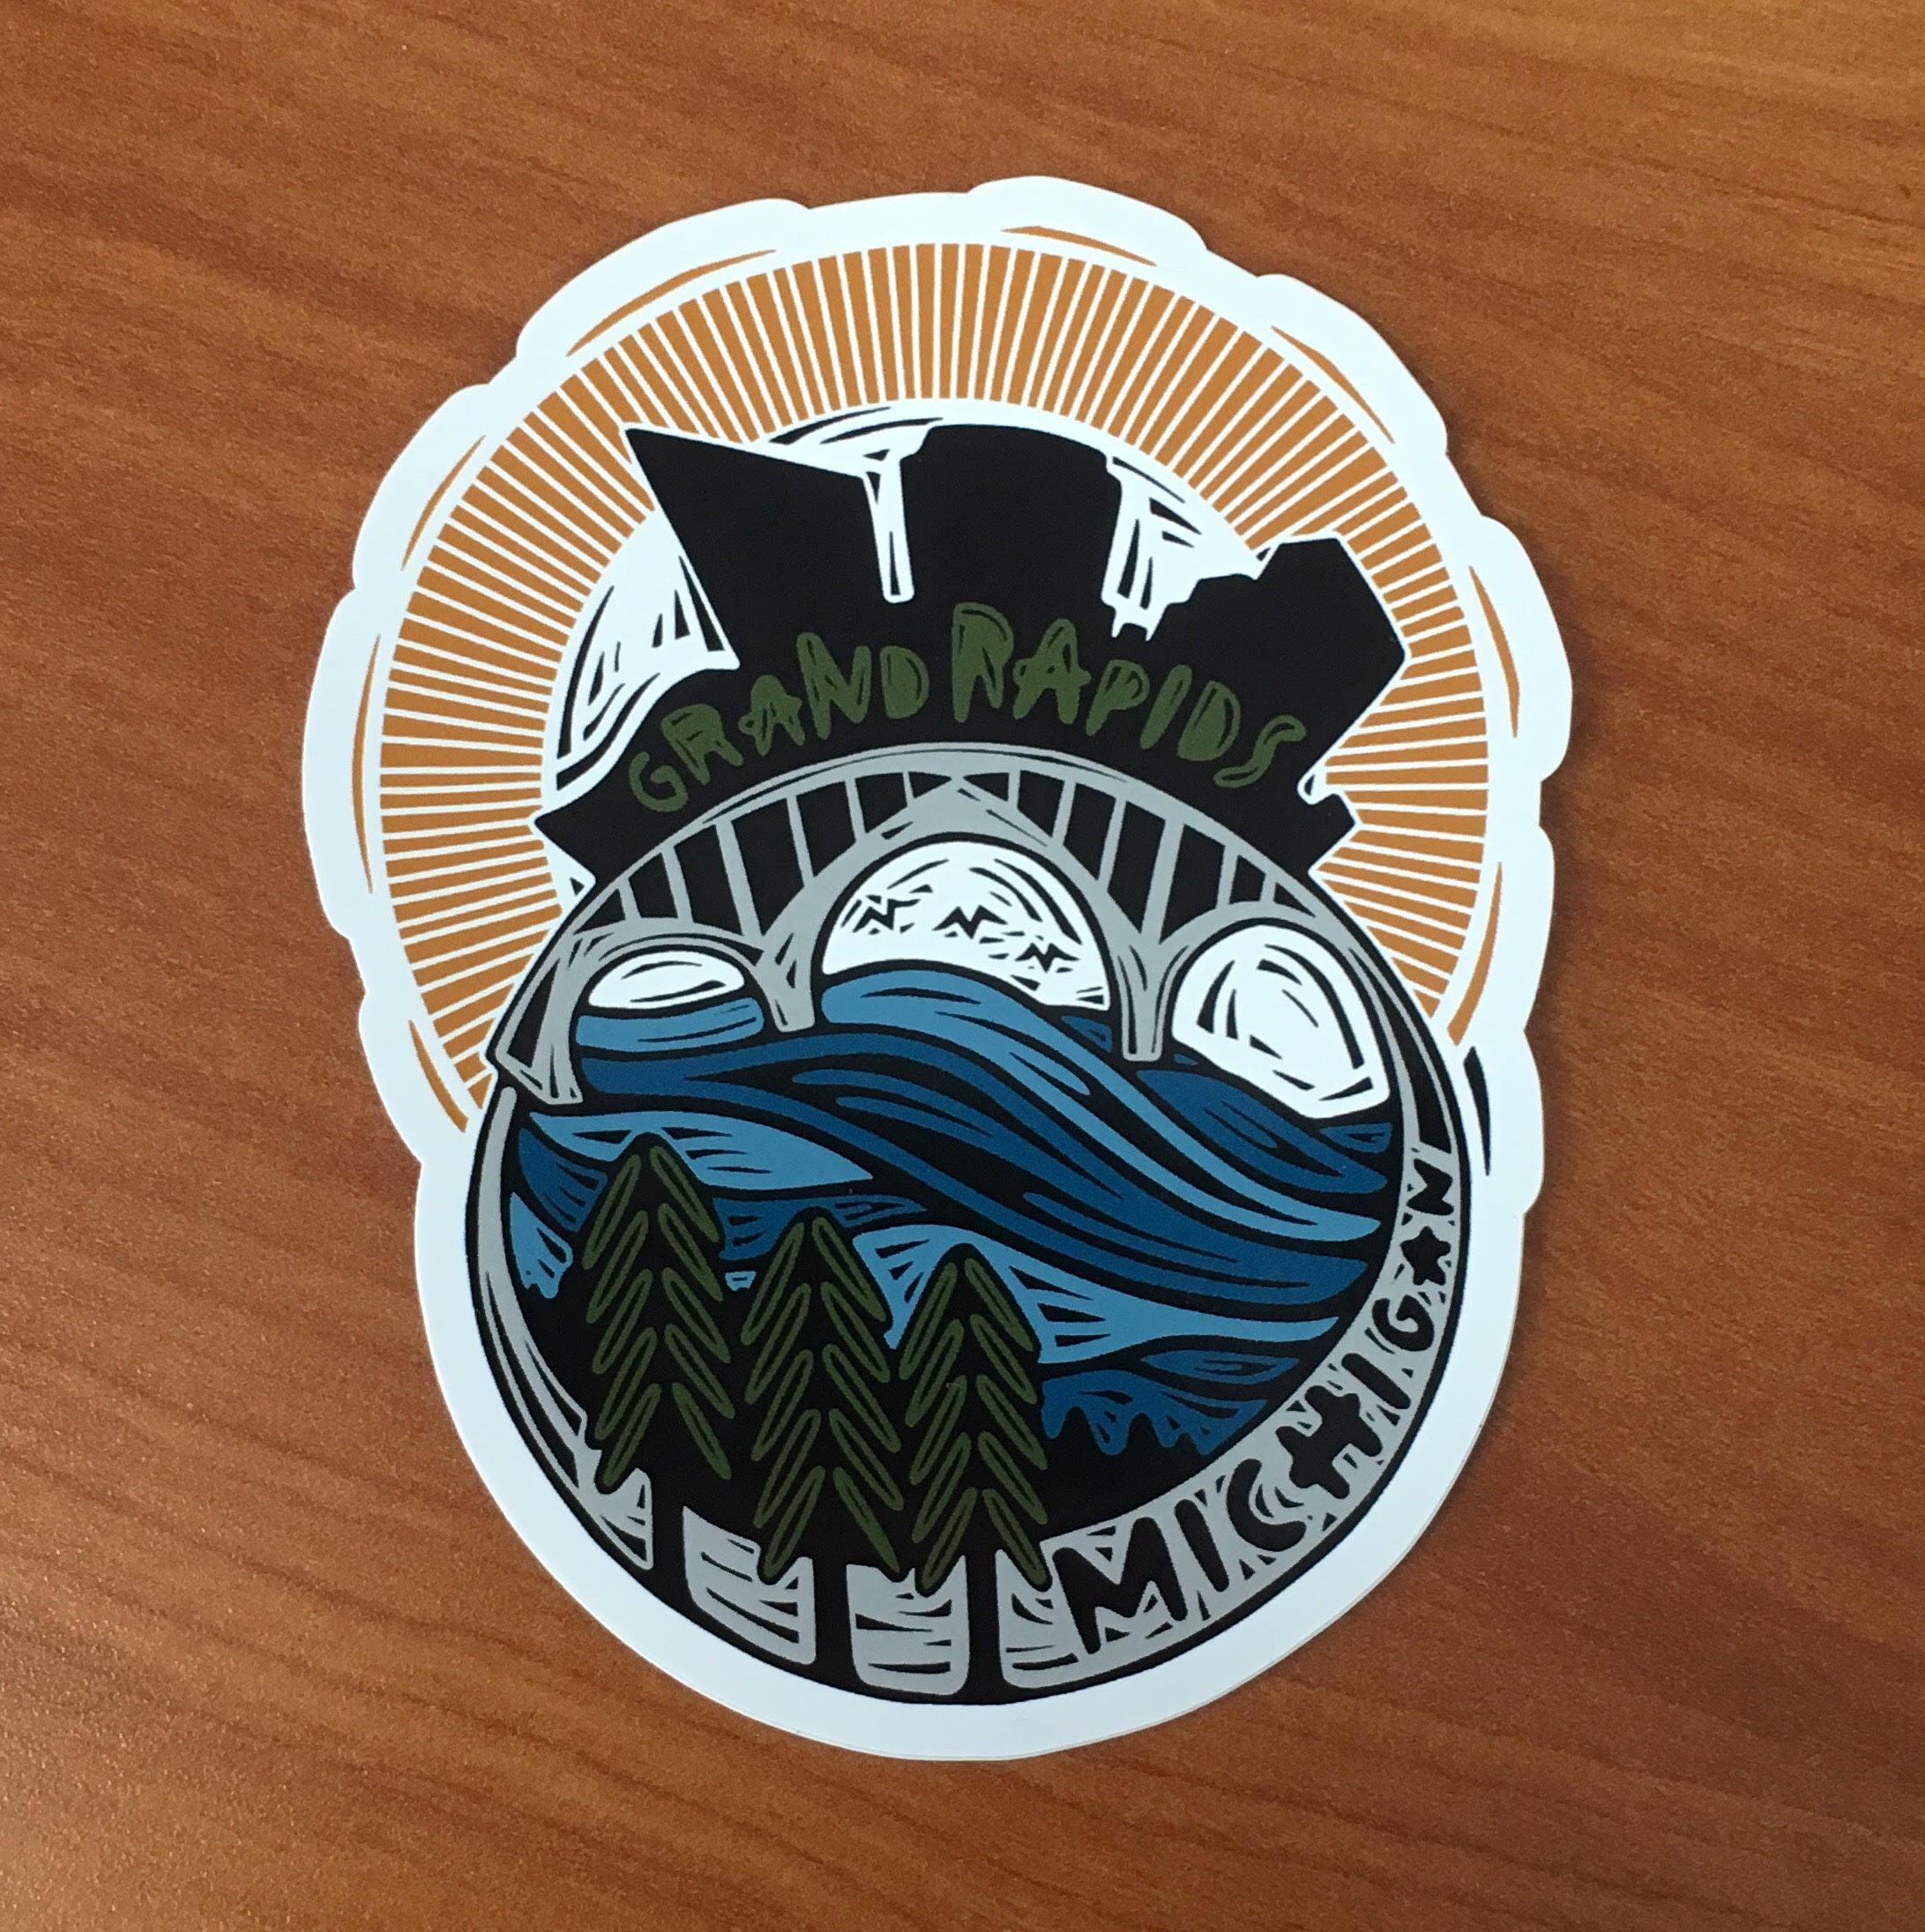 Woosah outfitters grand rapids sticker